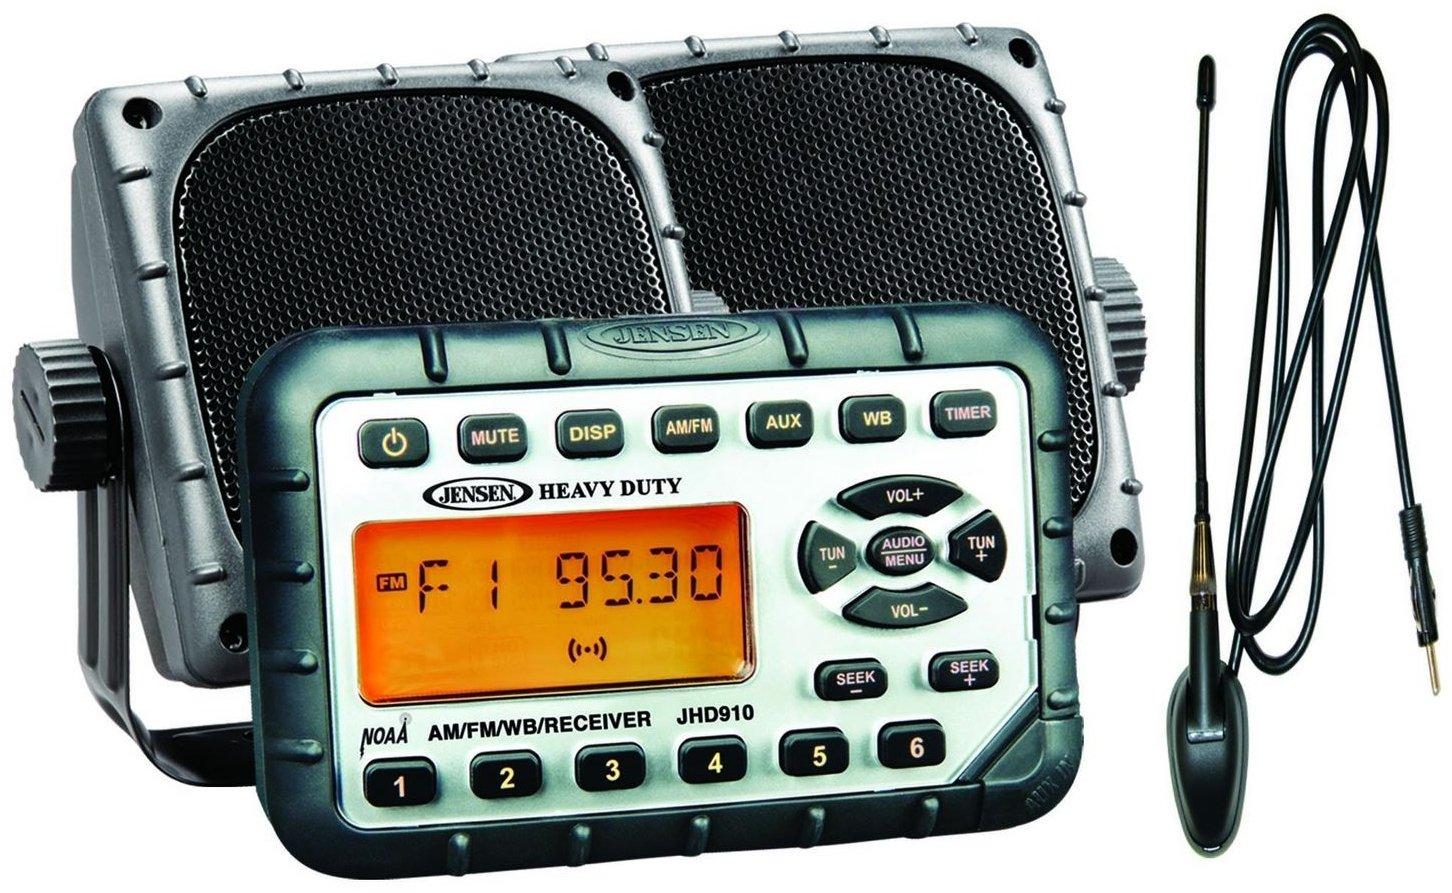 "Jensen JHD910PKG Package - Includes JHD910 Waterproof Mini AM/FM/WB/Stereo, Pair of 3.5"" Waterproof Mini Speakers and Top Side Rubber Antenna - ATV/UTV"